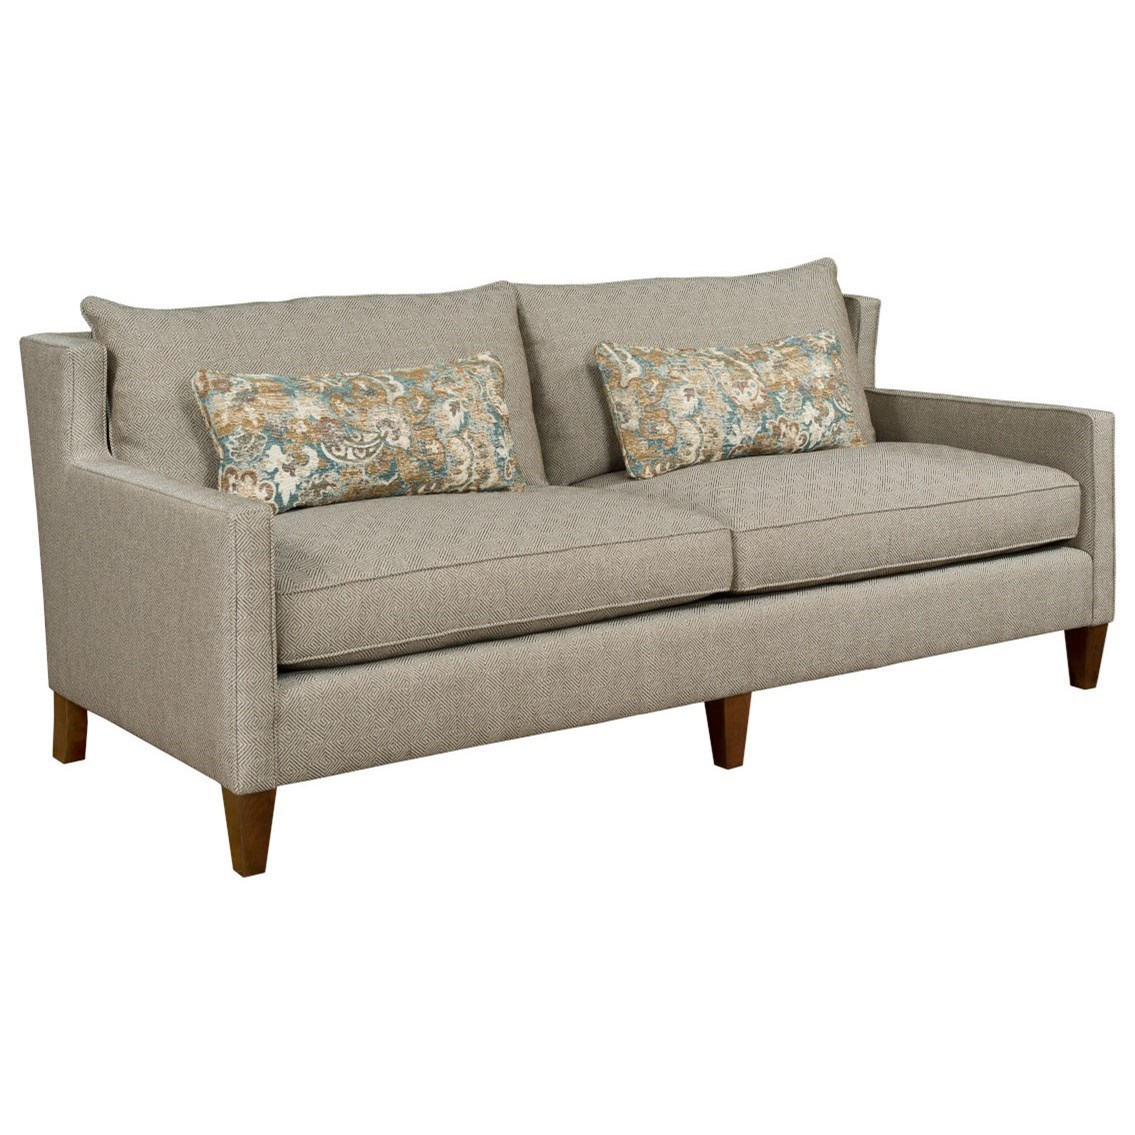 Alta Sofa by Kincaid Furniture at Hudson's Furniture